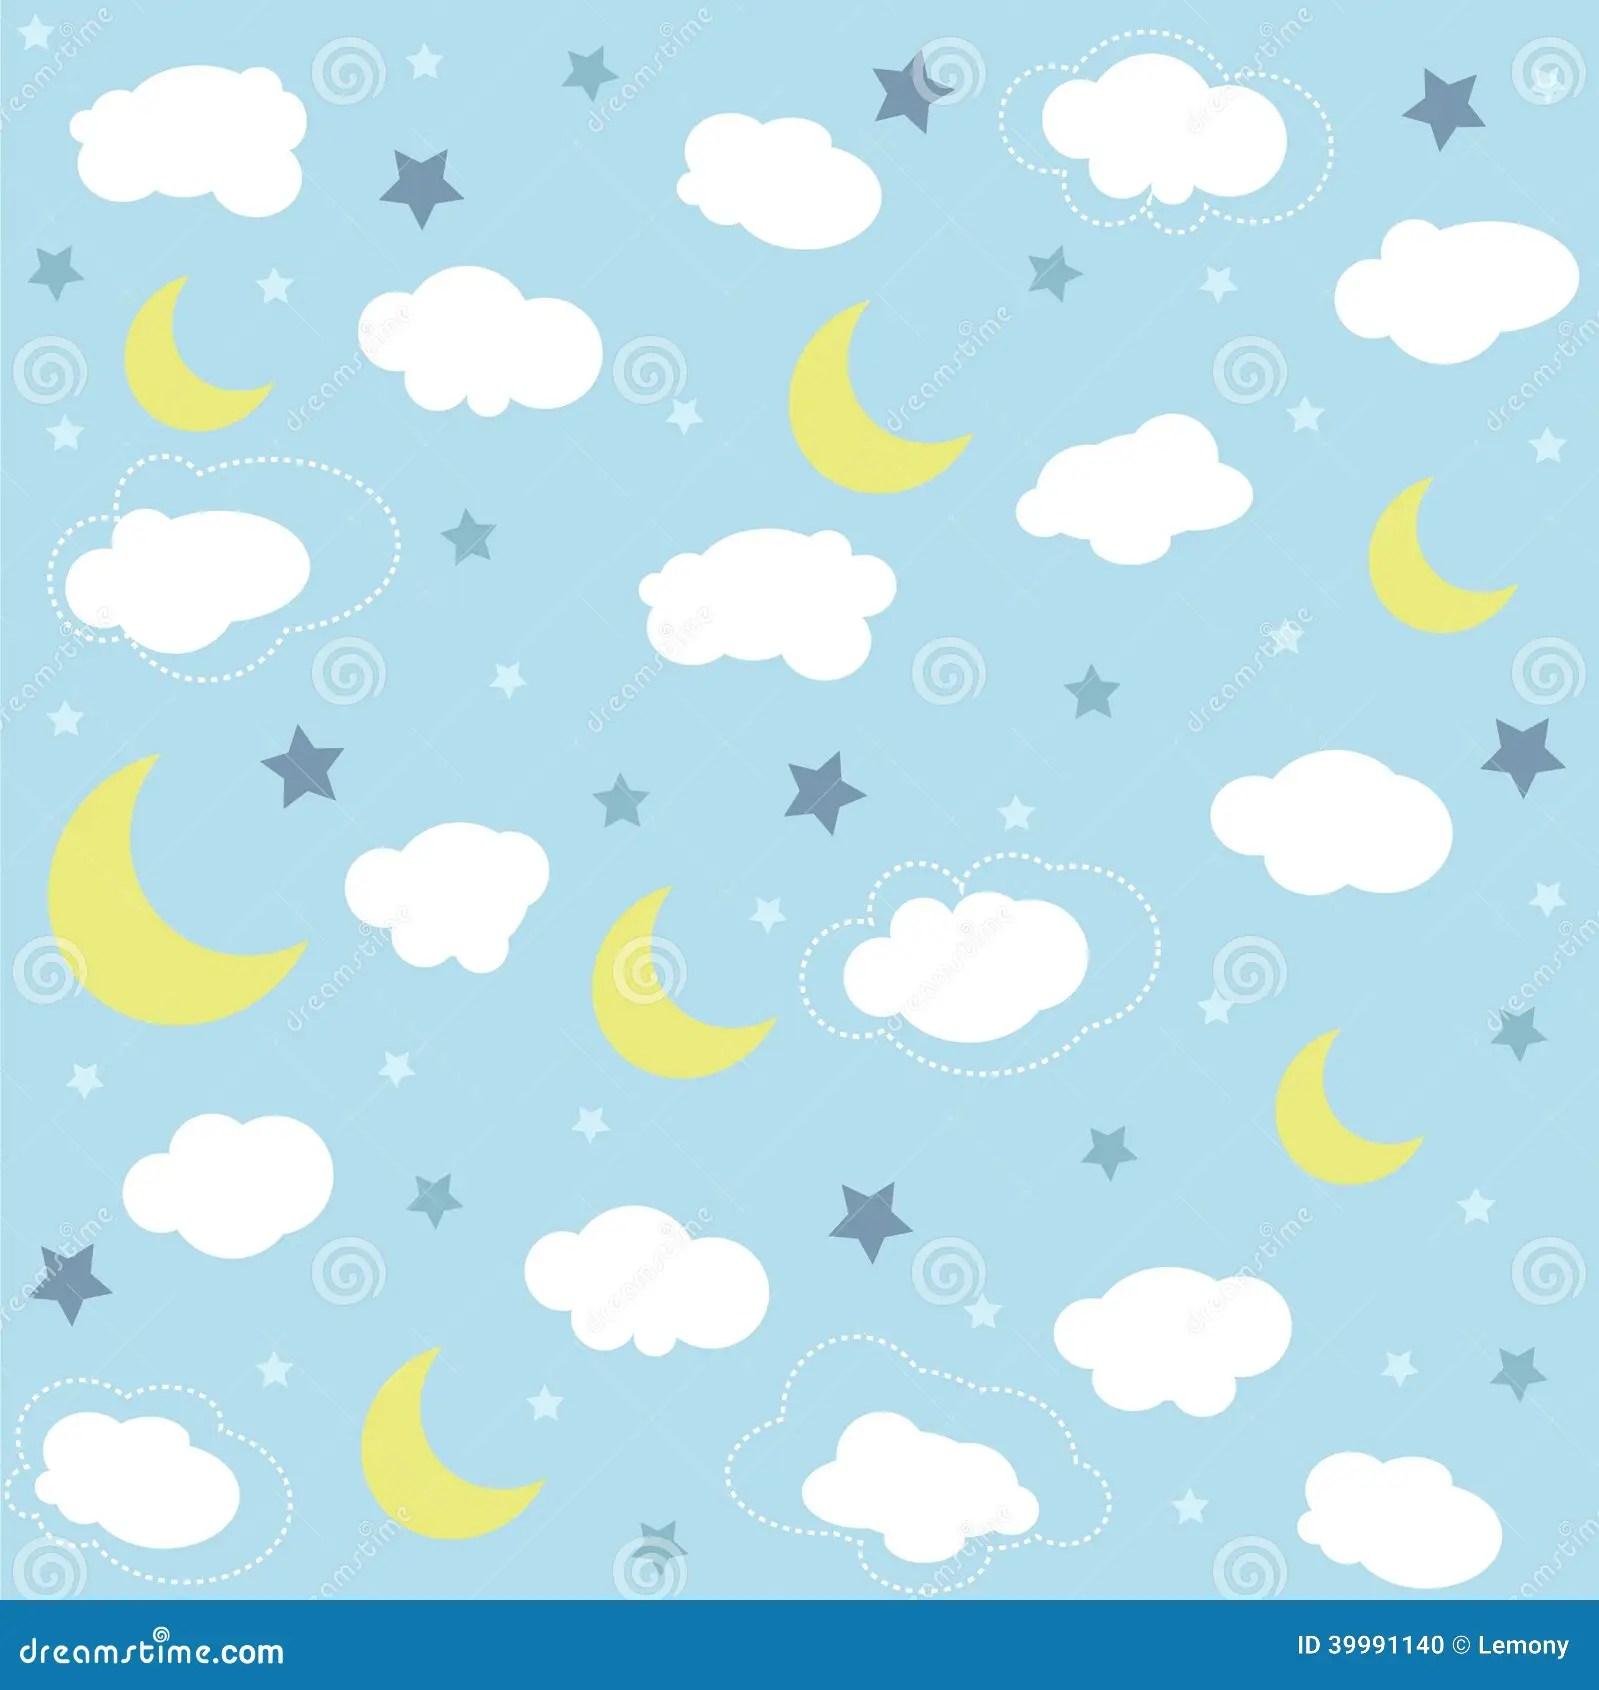 Baby Girl Nursery Wallpaper Borders Seamless Baby Pattern Wallpaper Stock Photo Image Of